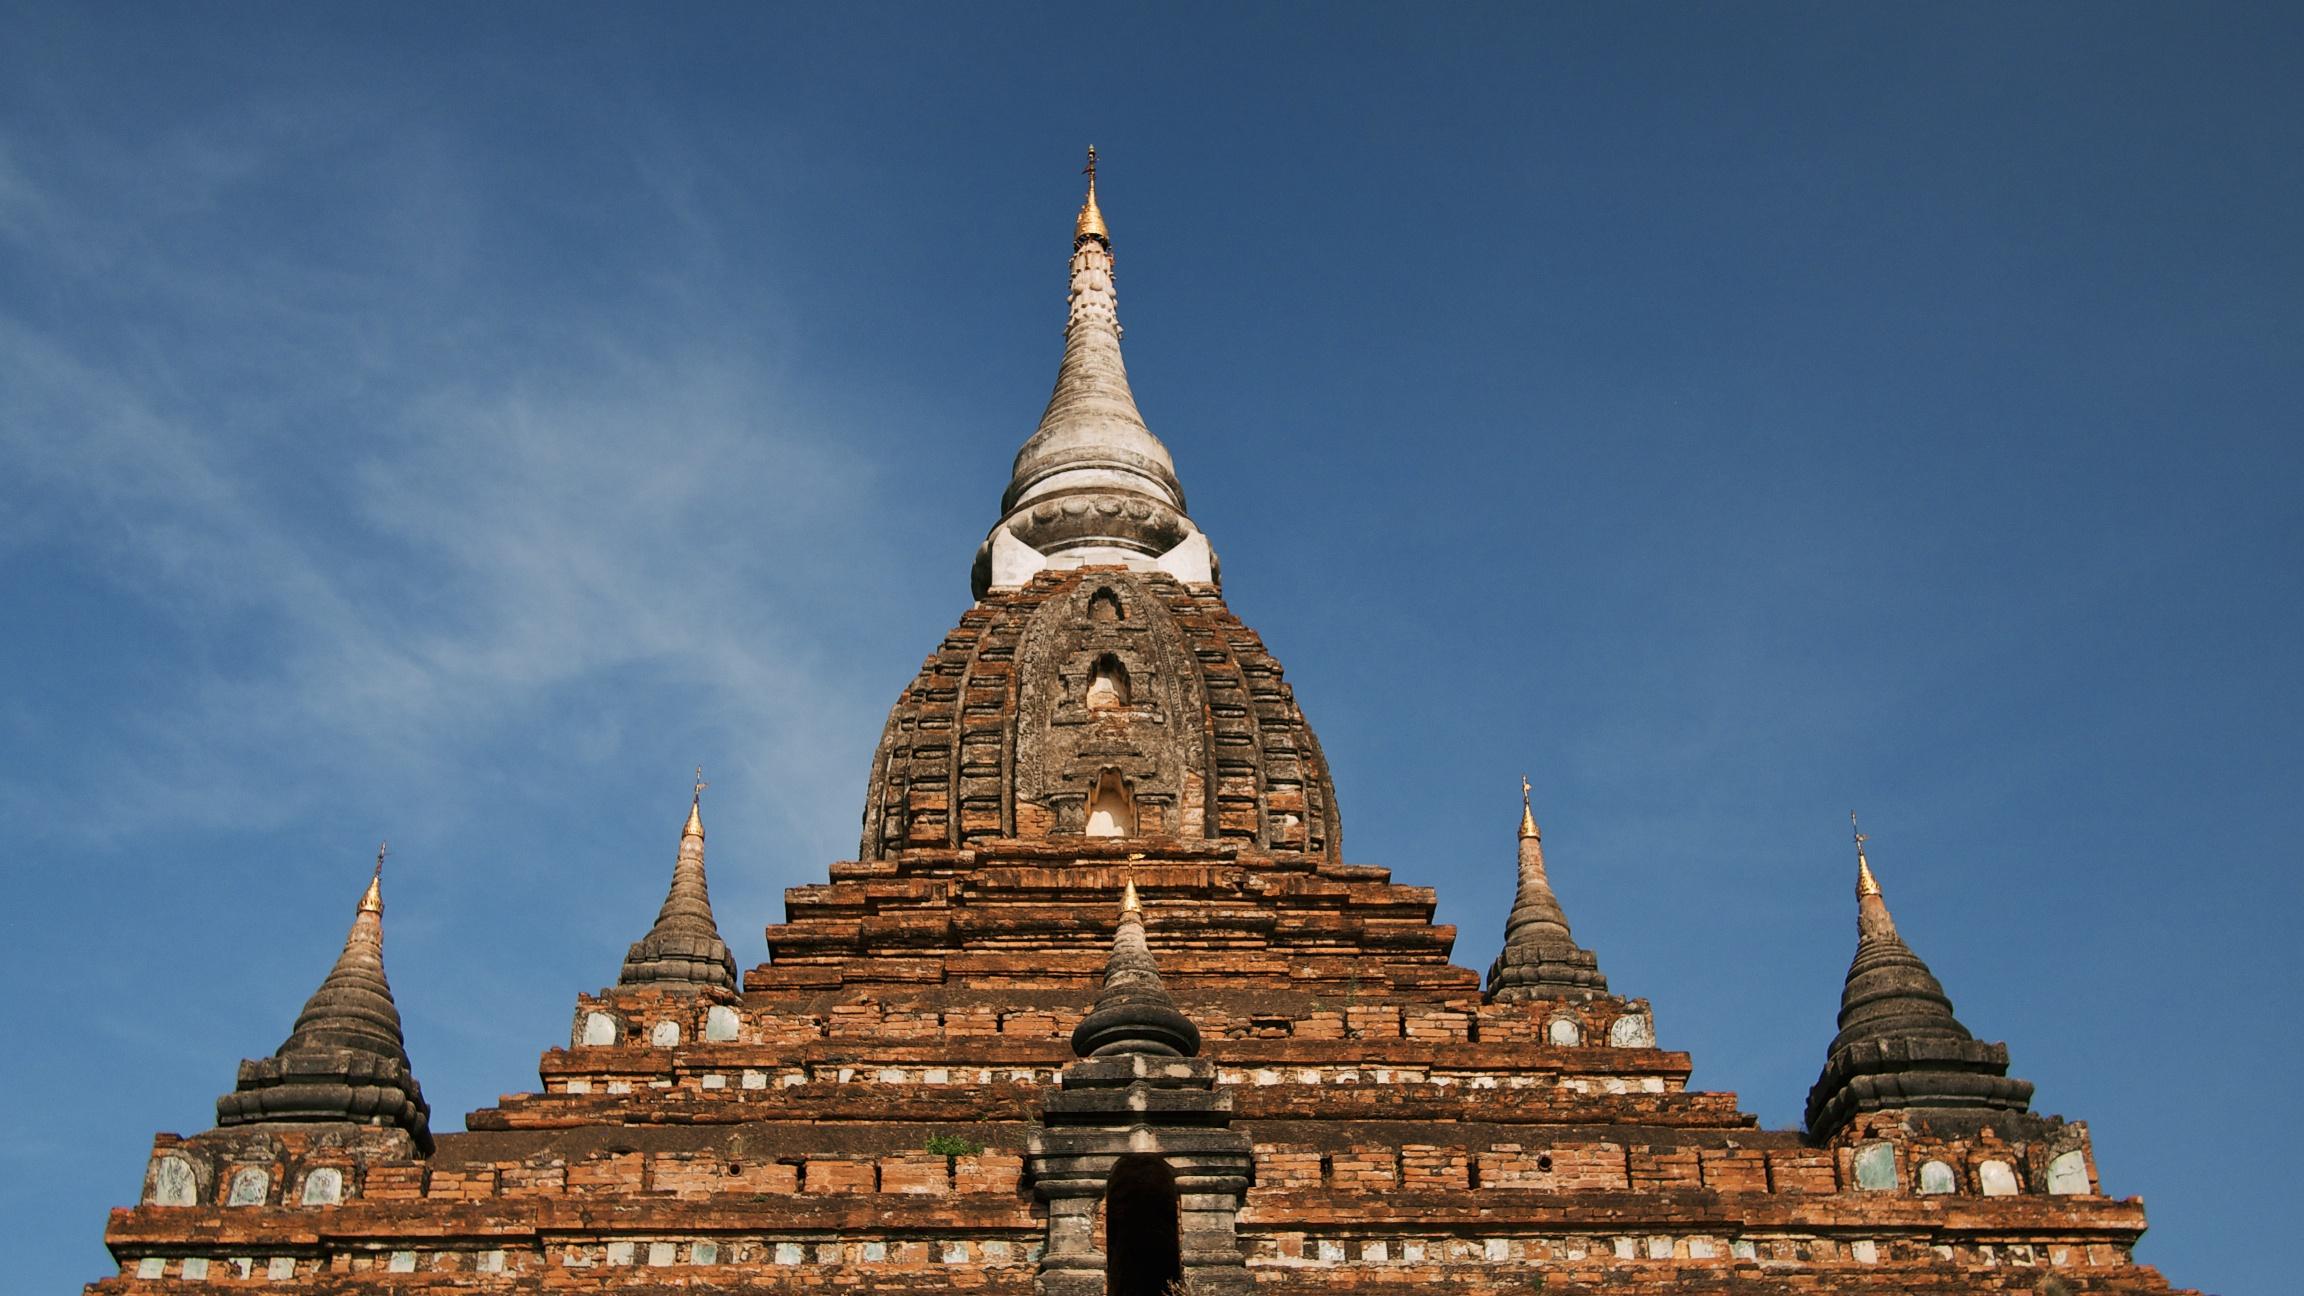 Nagayom Pagoda